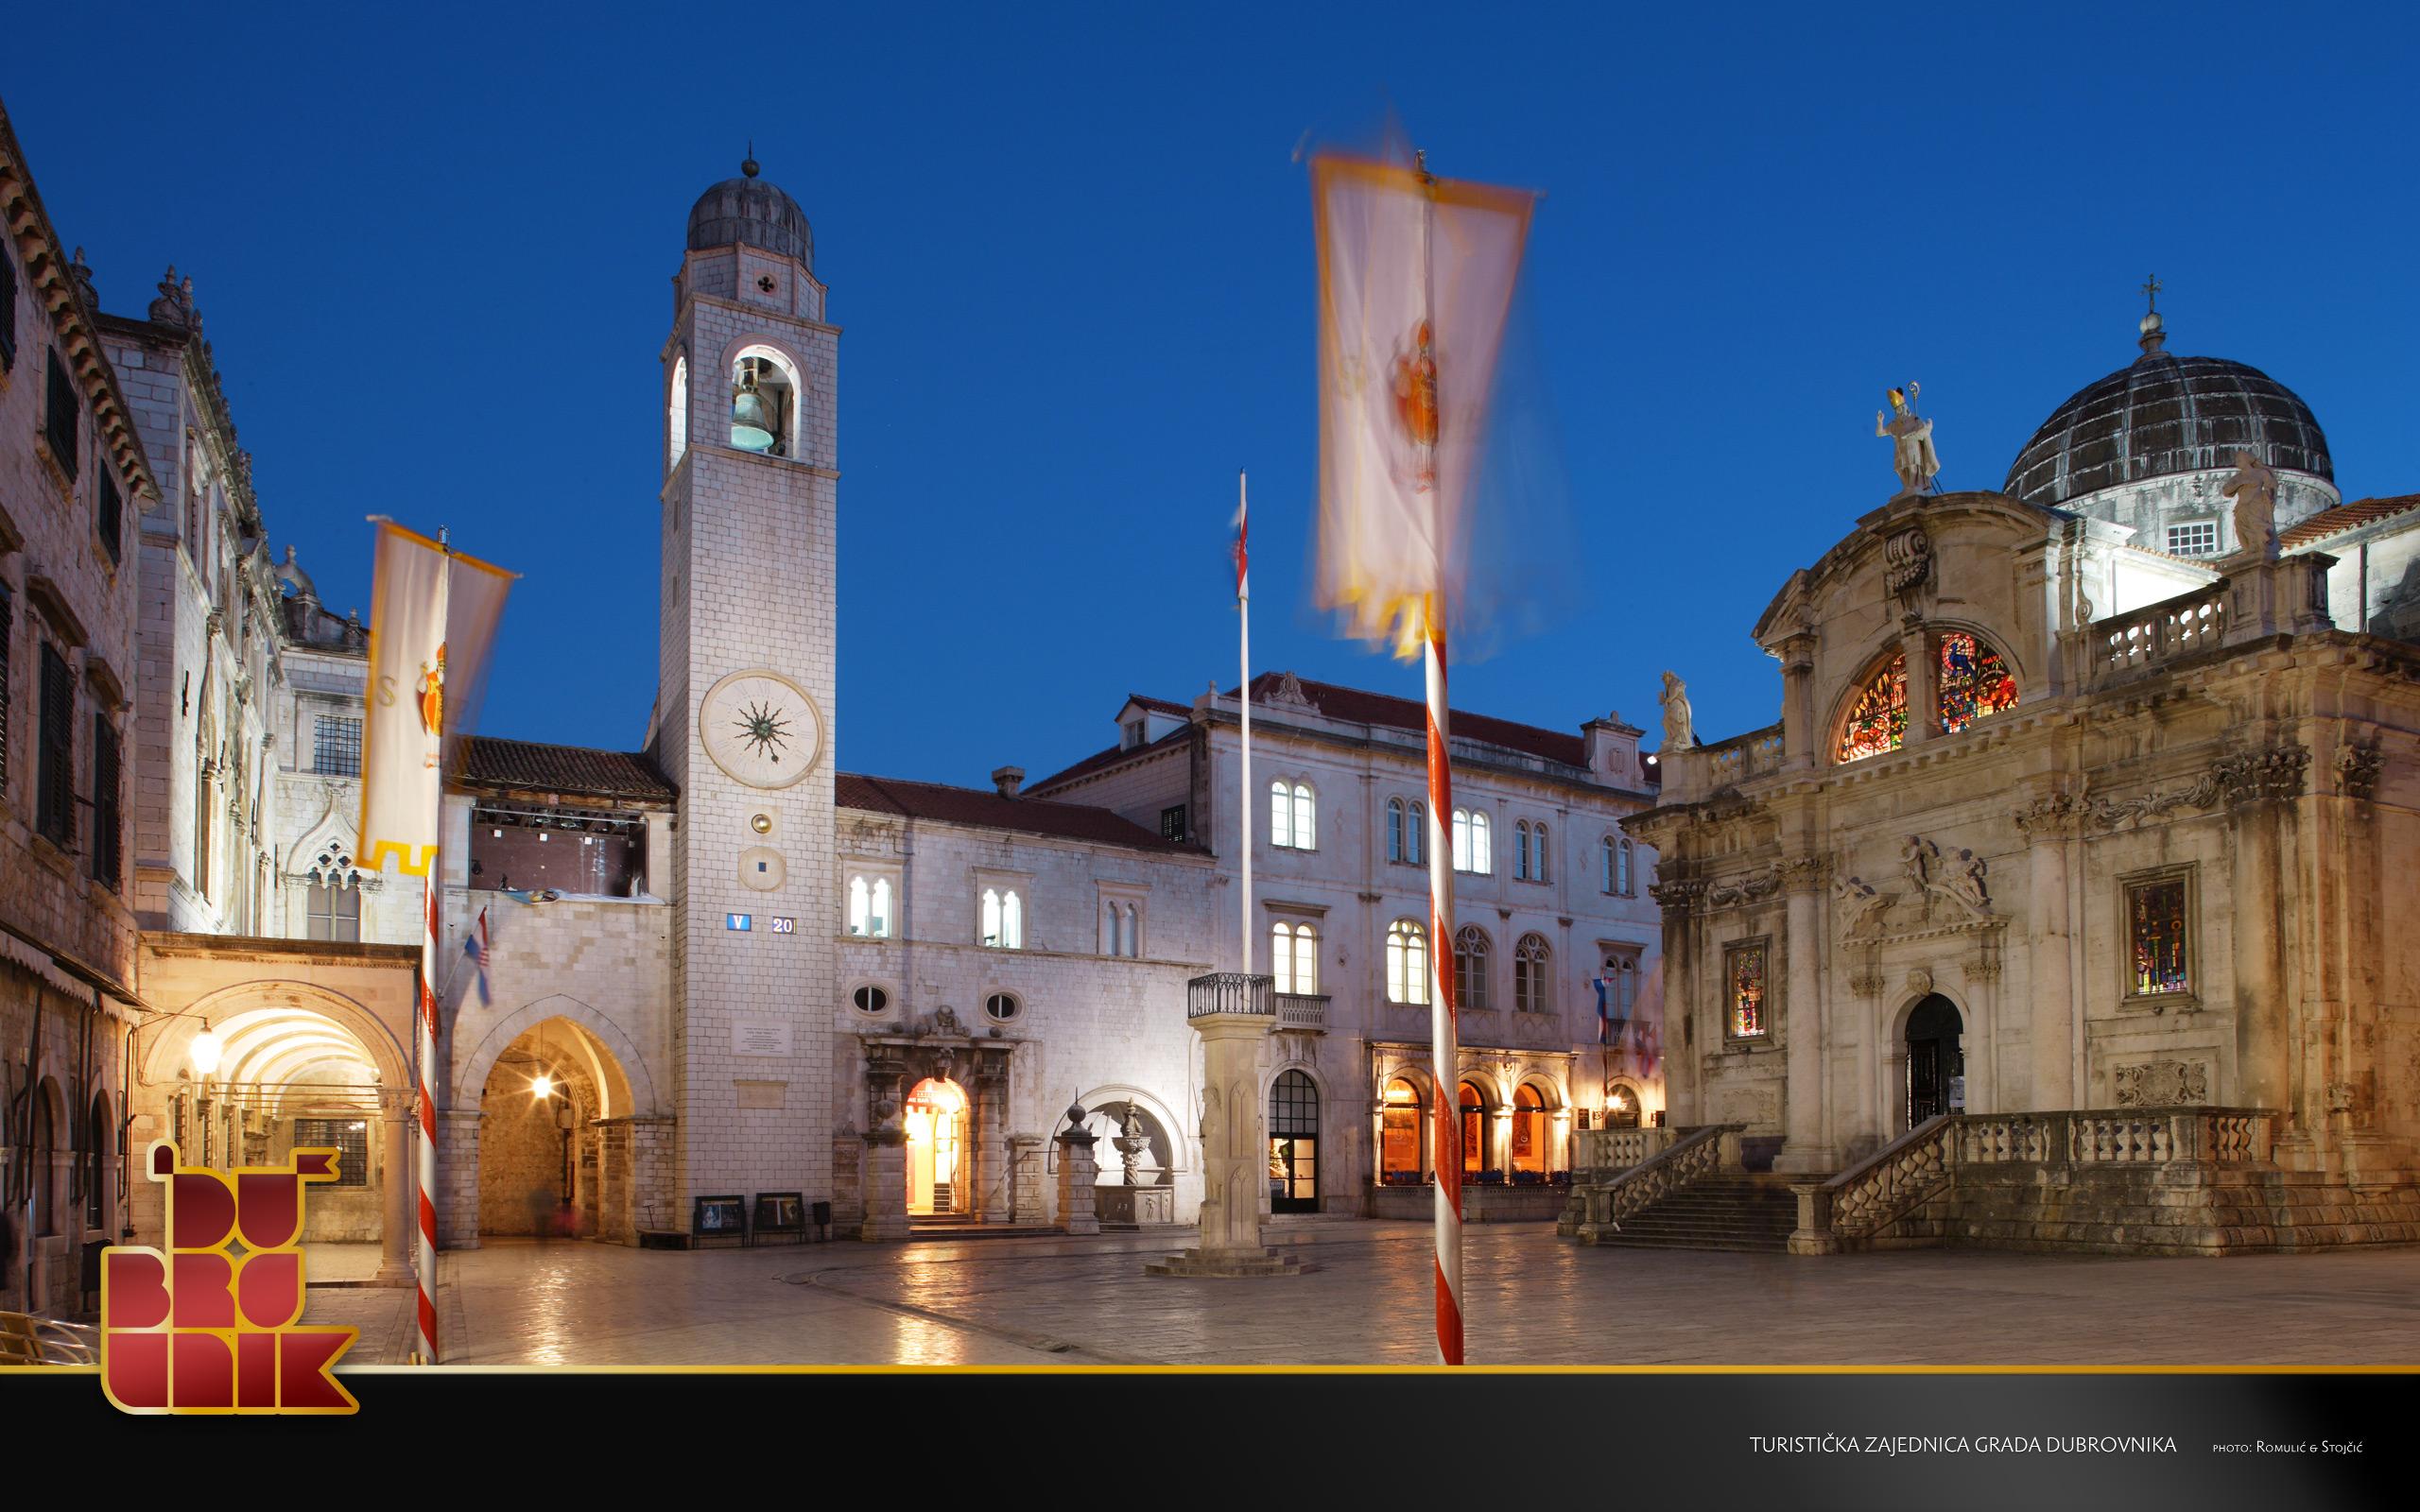 Dubrovnik by night - Photo credit Dubrovnik Tourist Board